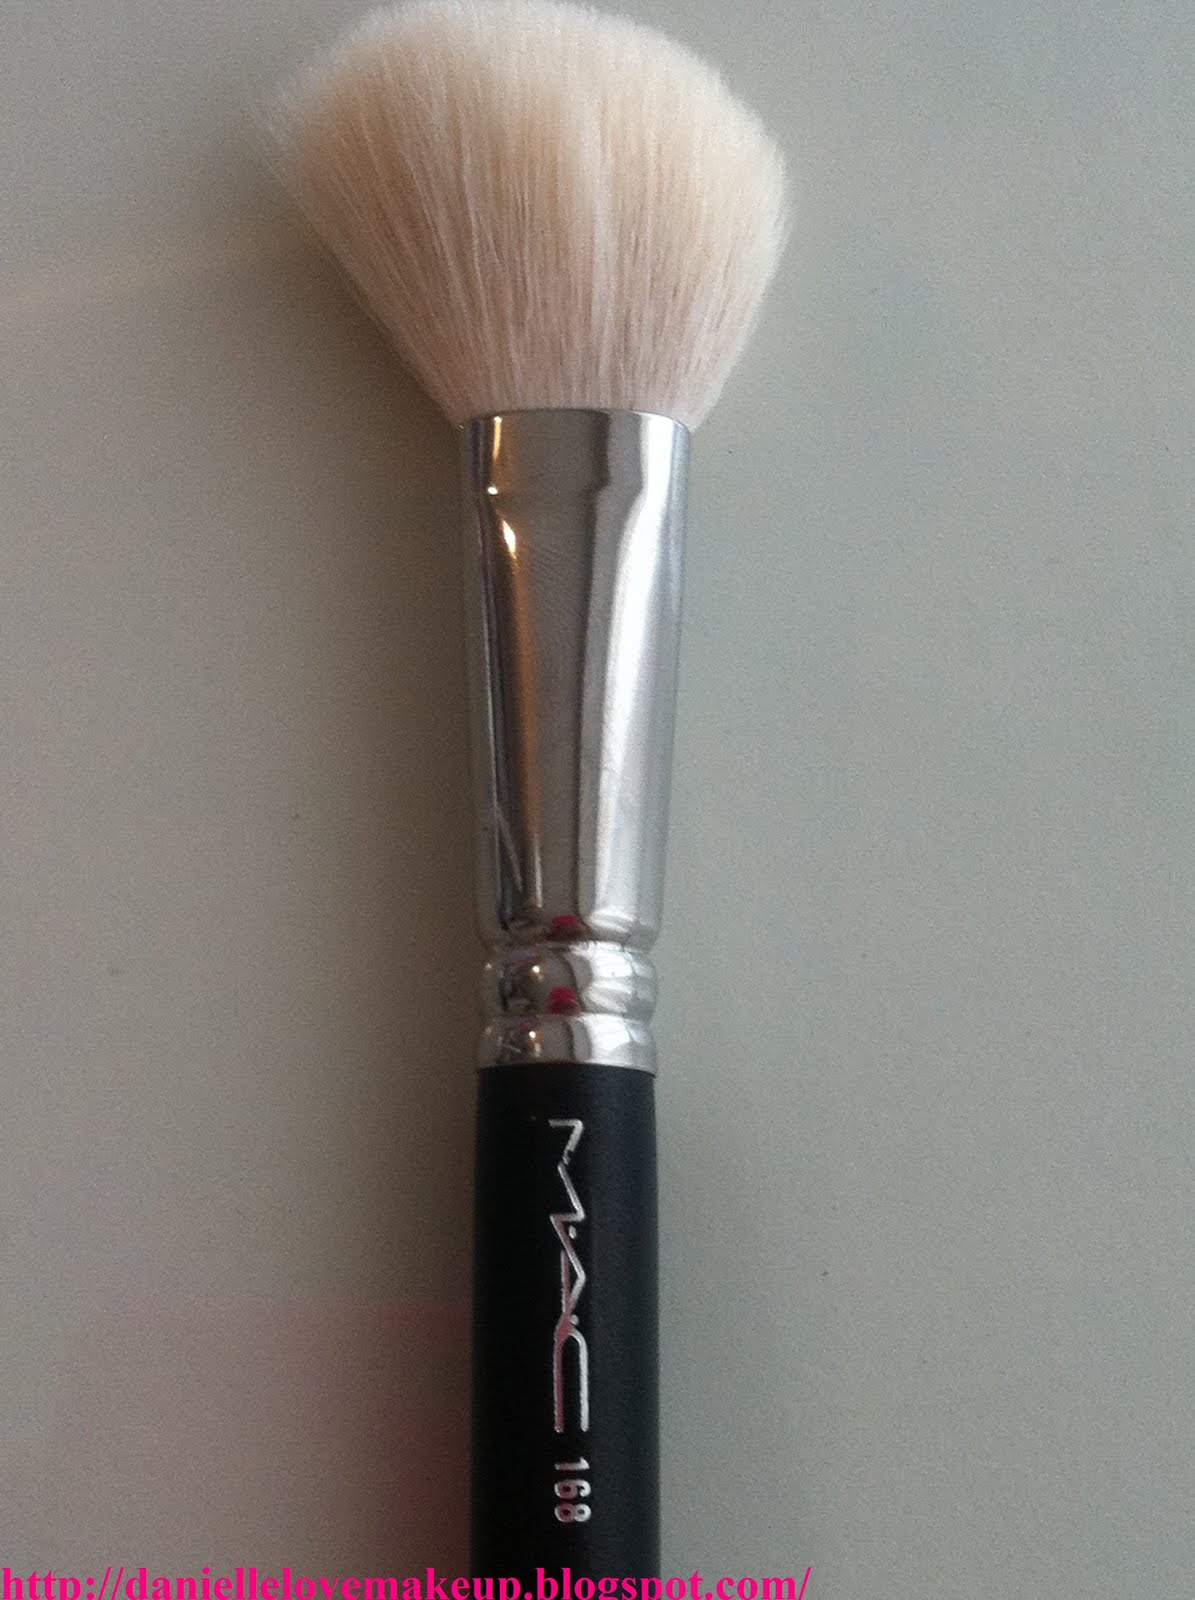 Mac 168 Large Angled Contour Brush: DanielleLoveMakeup: My Top 5 MAC Face Brushes For Beginners